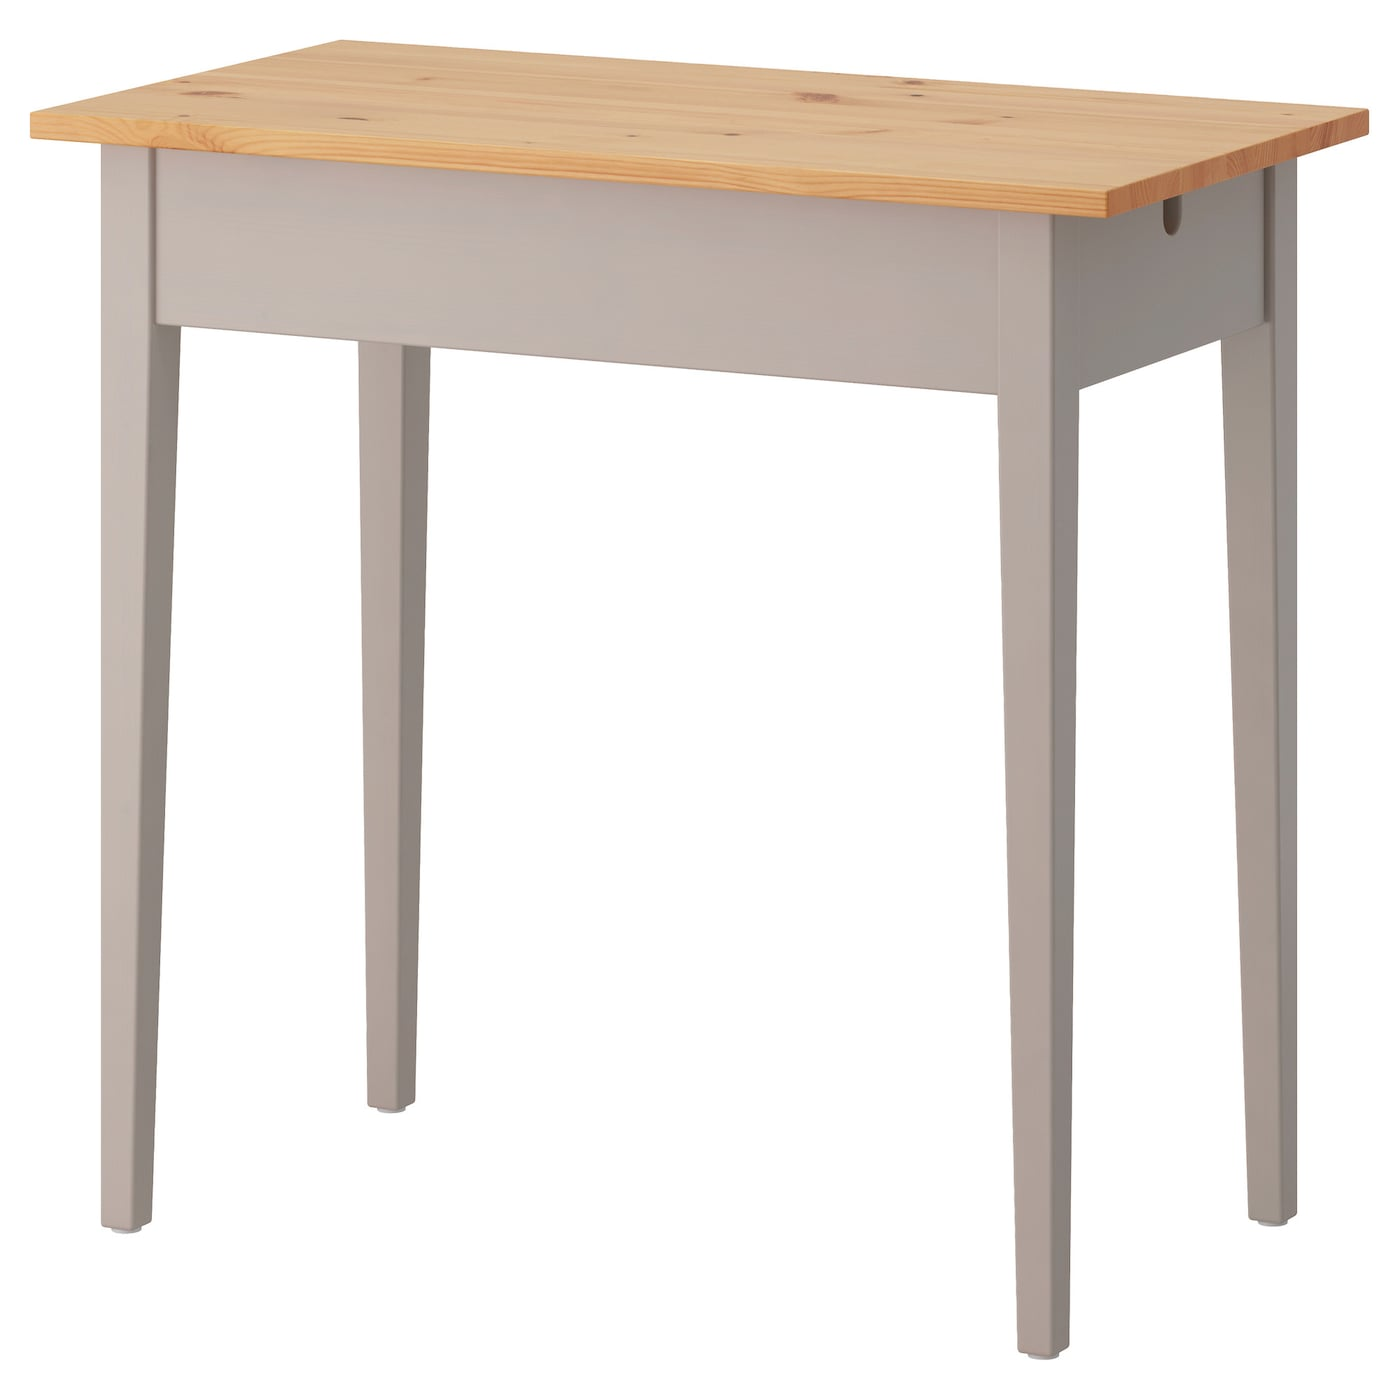 NORRÅSEN | Büro > Bürotische > Computertische | Grau | IKEA